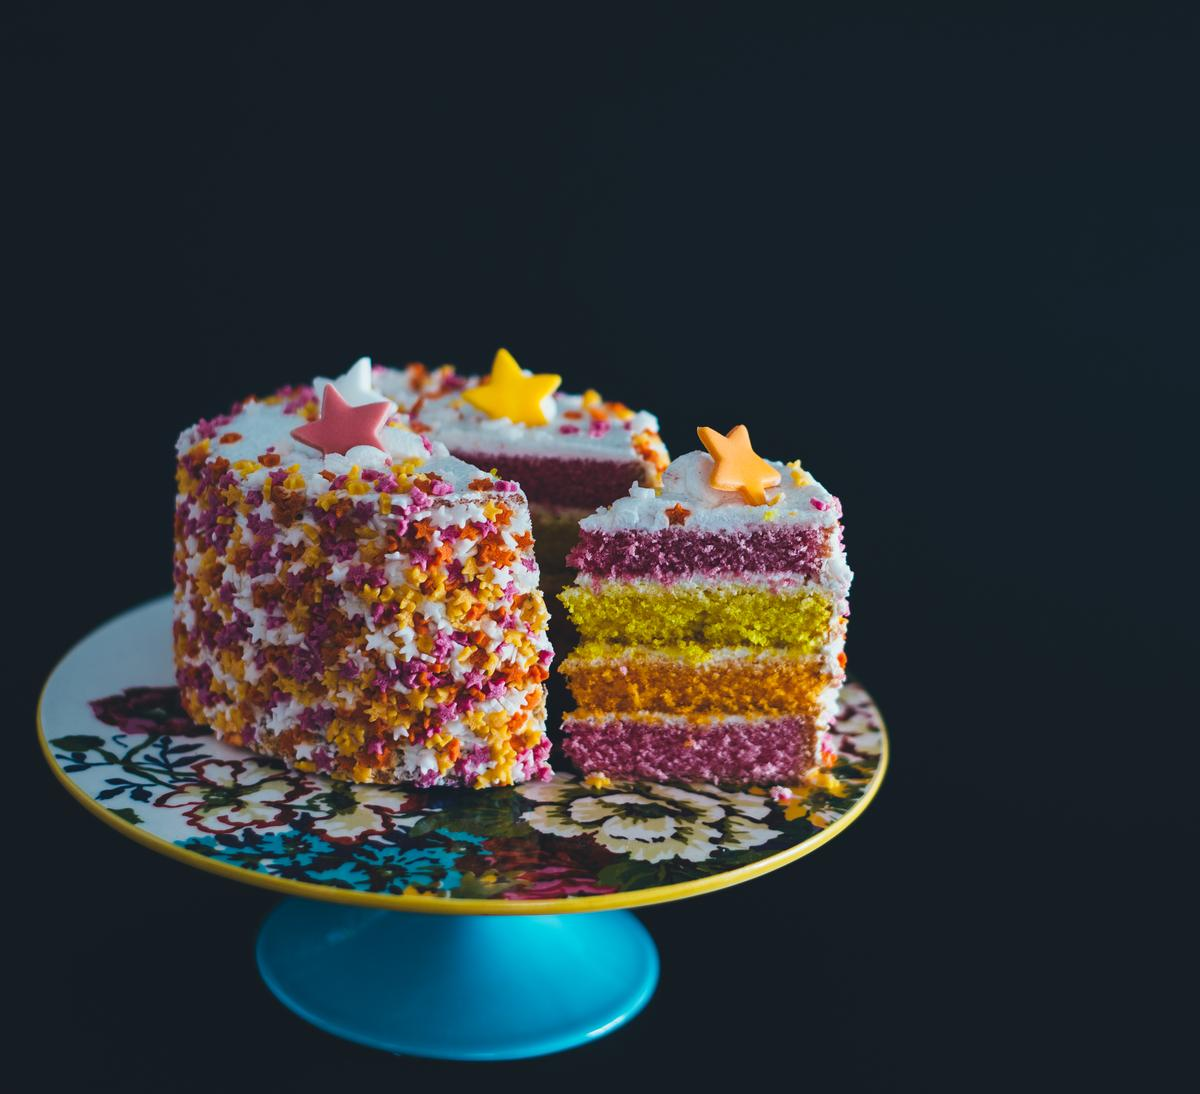 How Do Mathematicians Cut Cake?